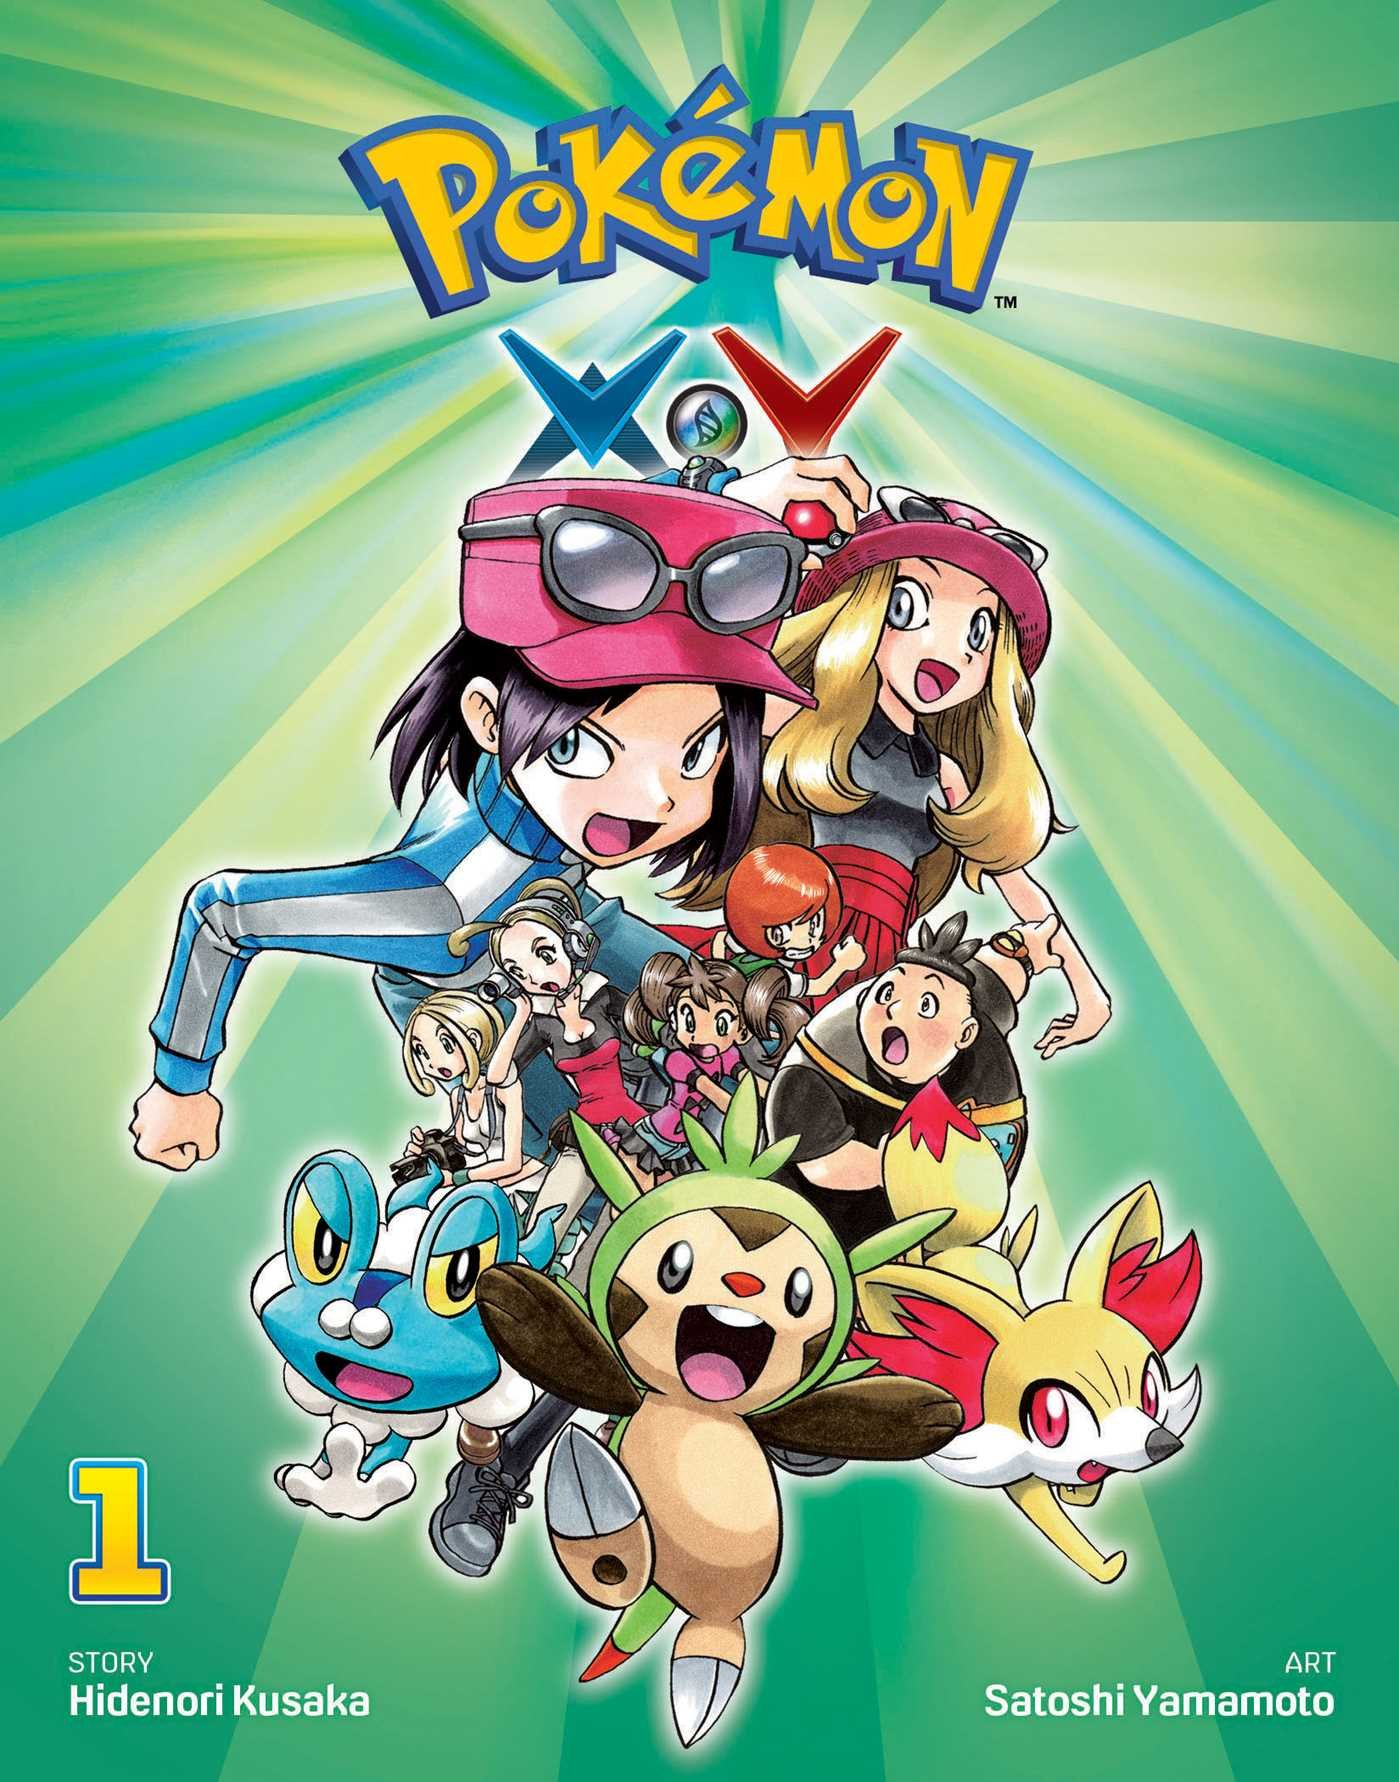 Pok%C3%A9mon X Y Vol 1 Pokemon product image